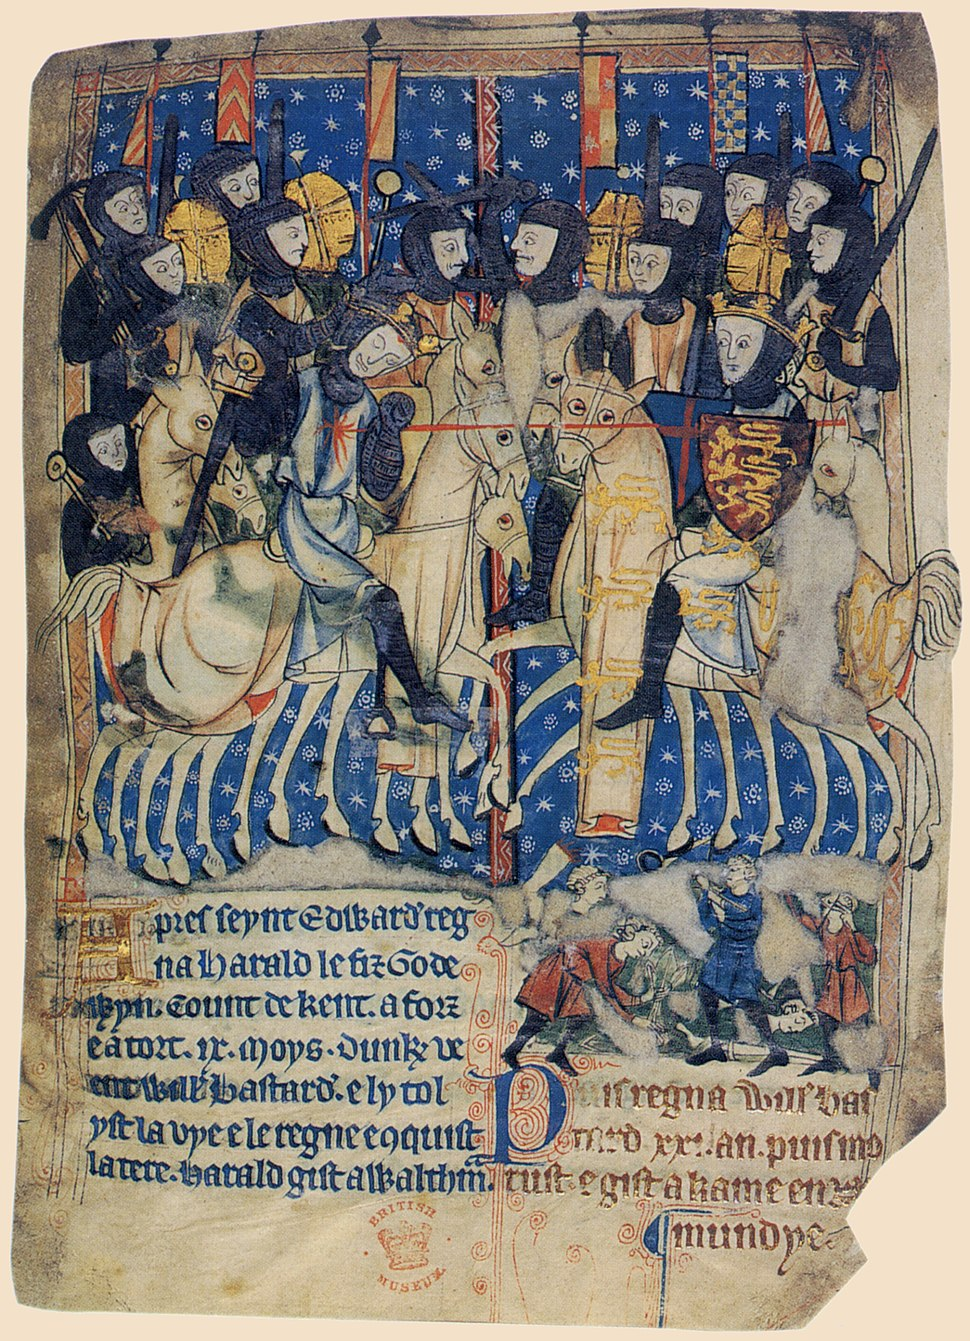 Manuscript of XIII BC Battle of Hastings